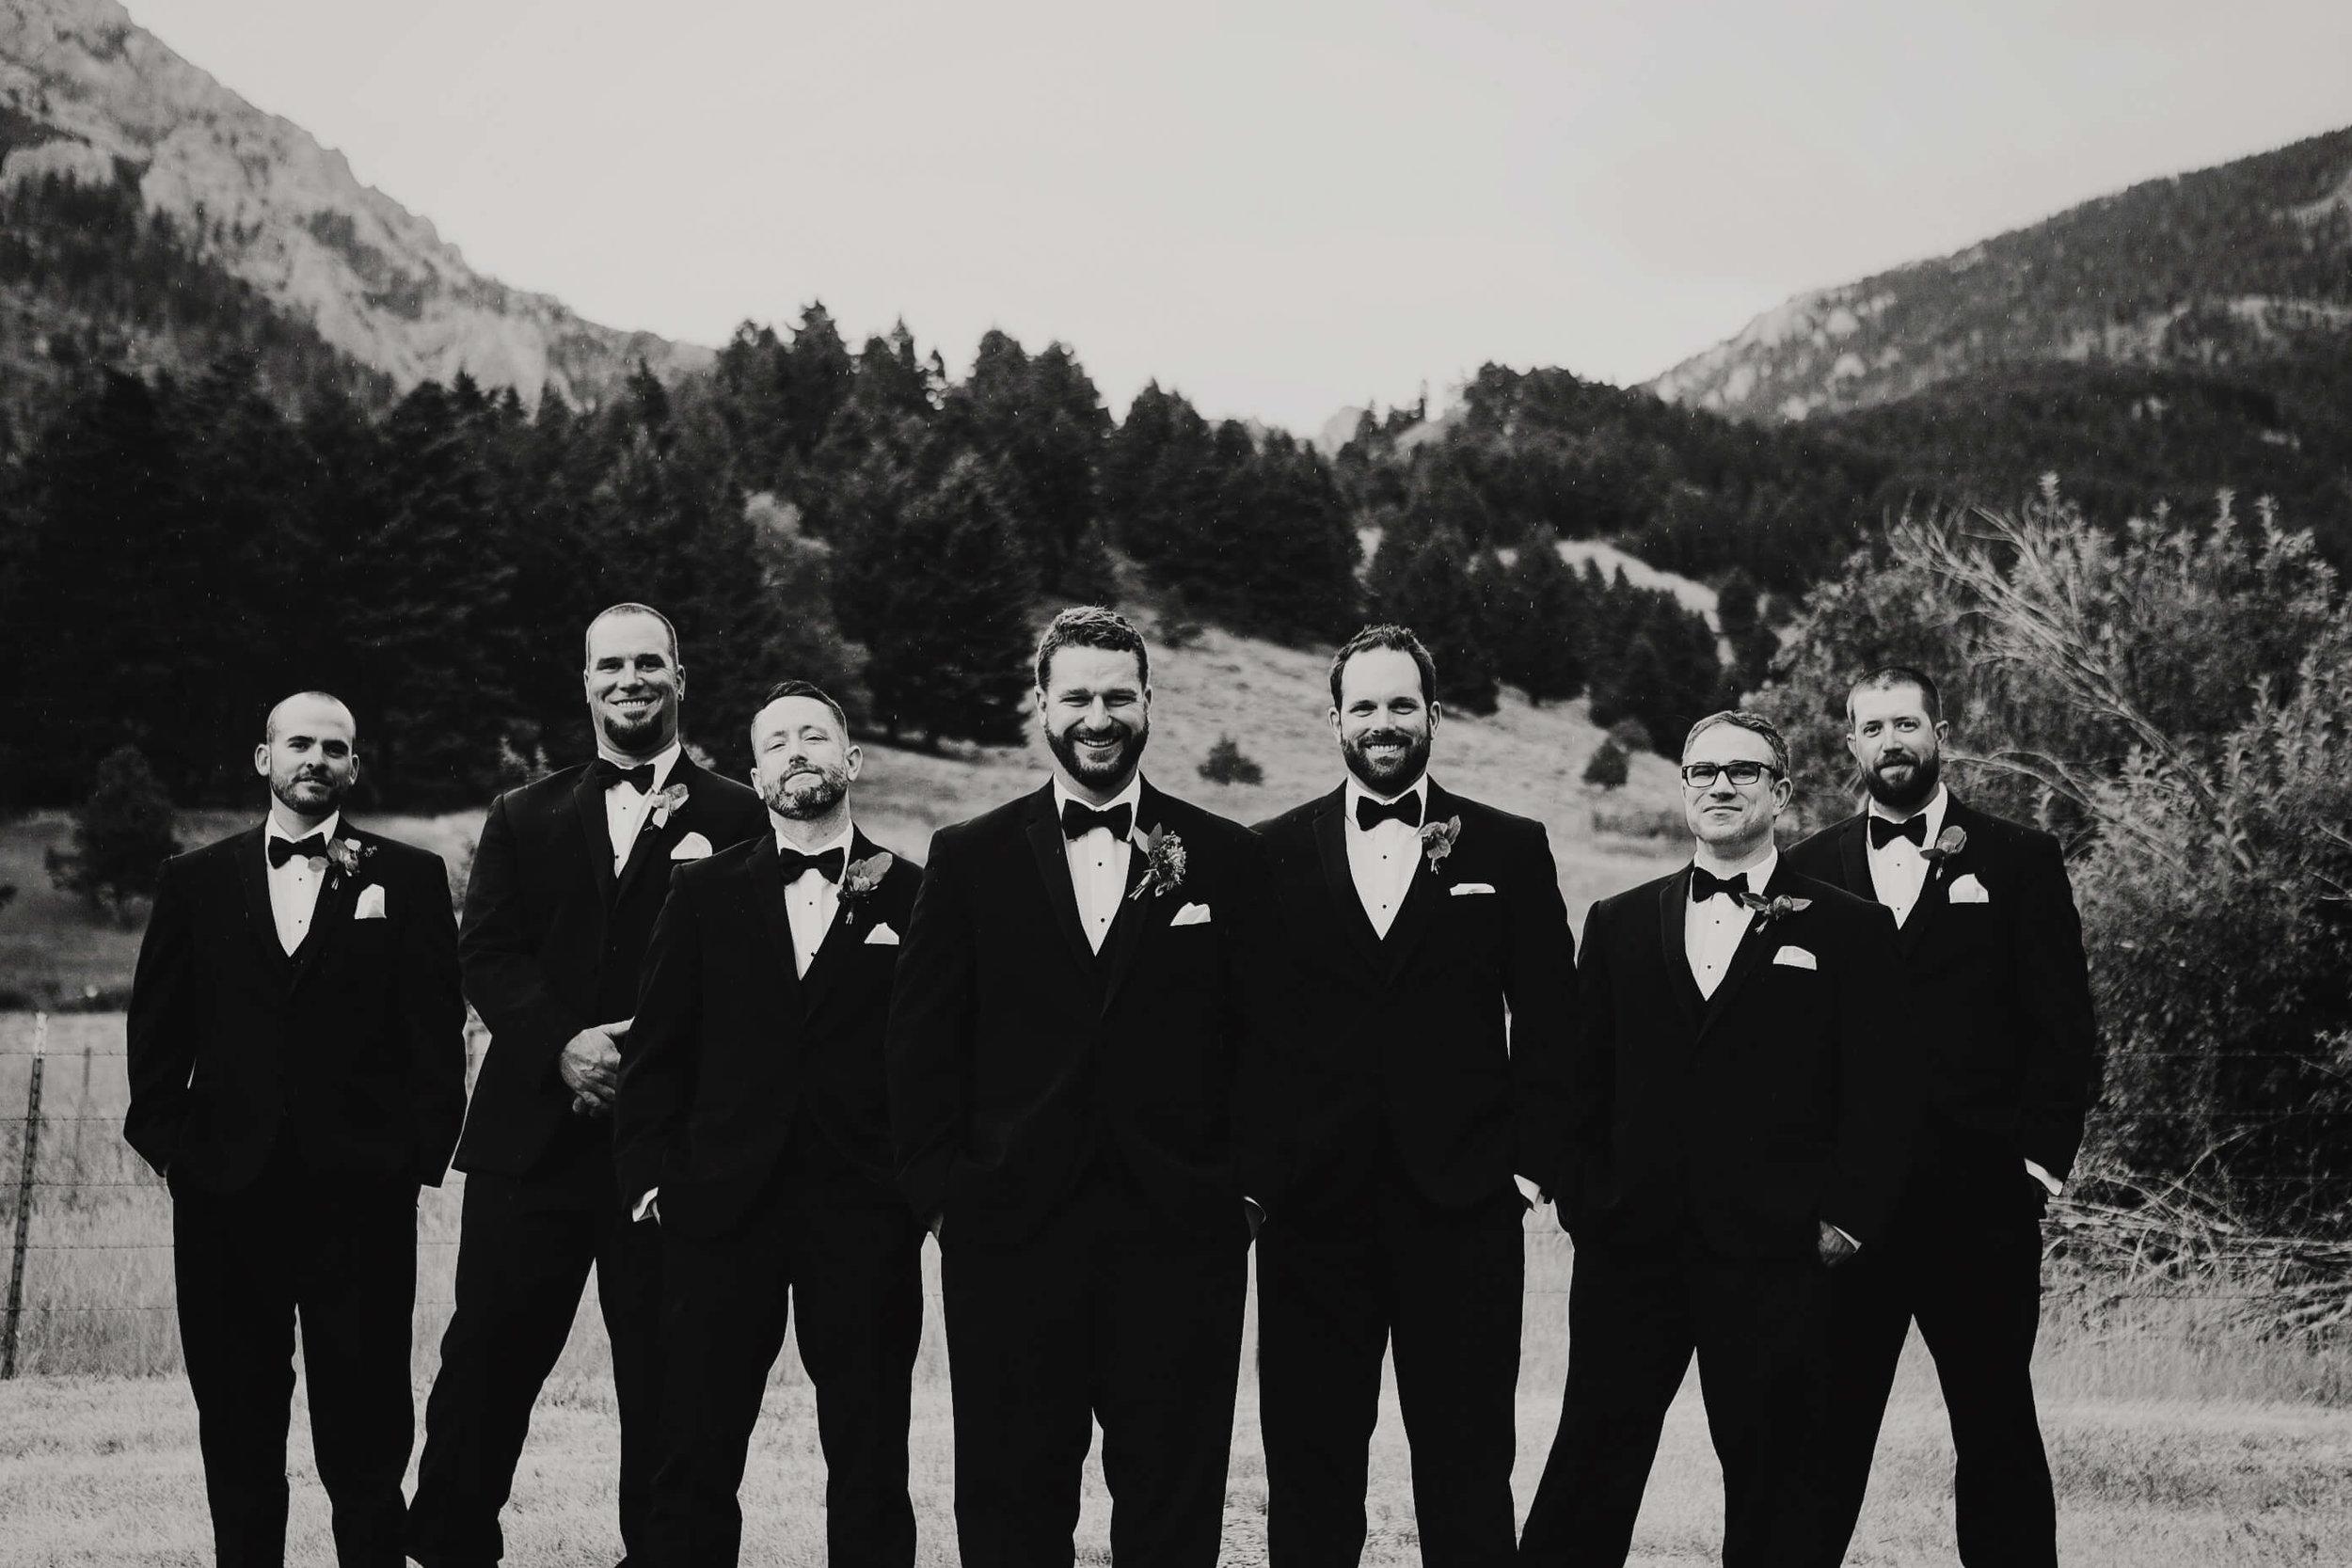 engle-olson-fran-ze-photo-montana-wedding-43.jpg